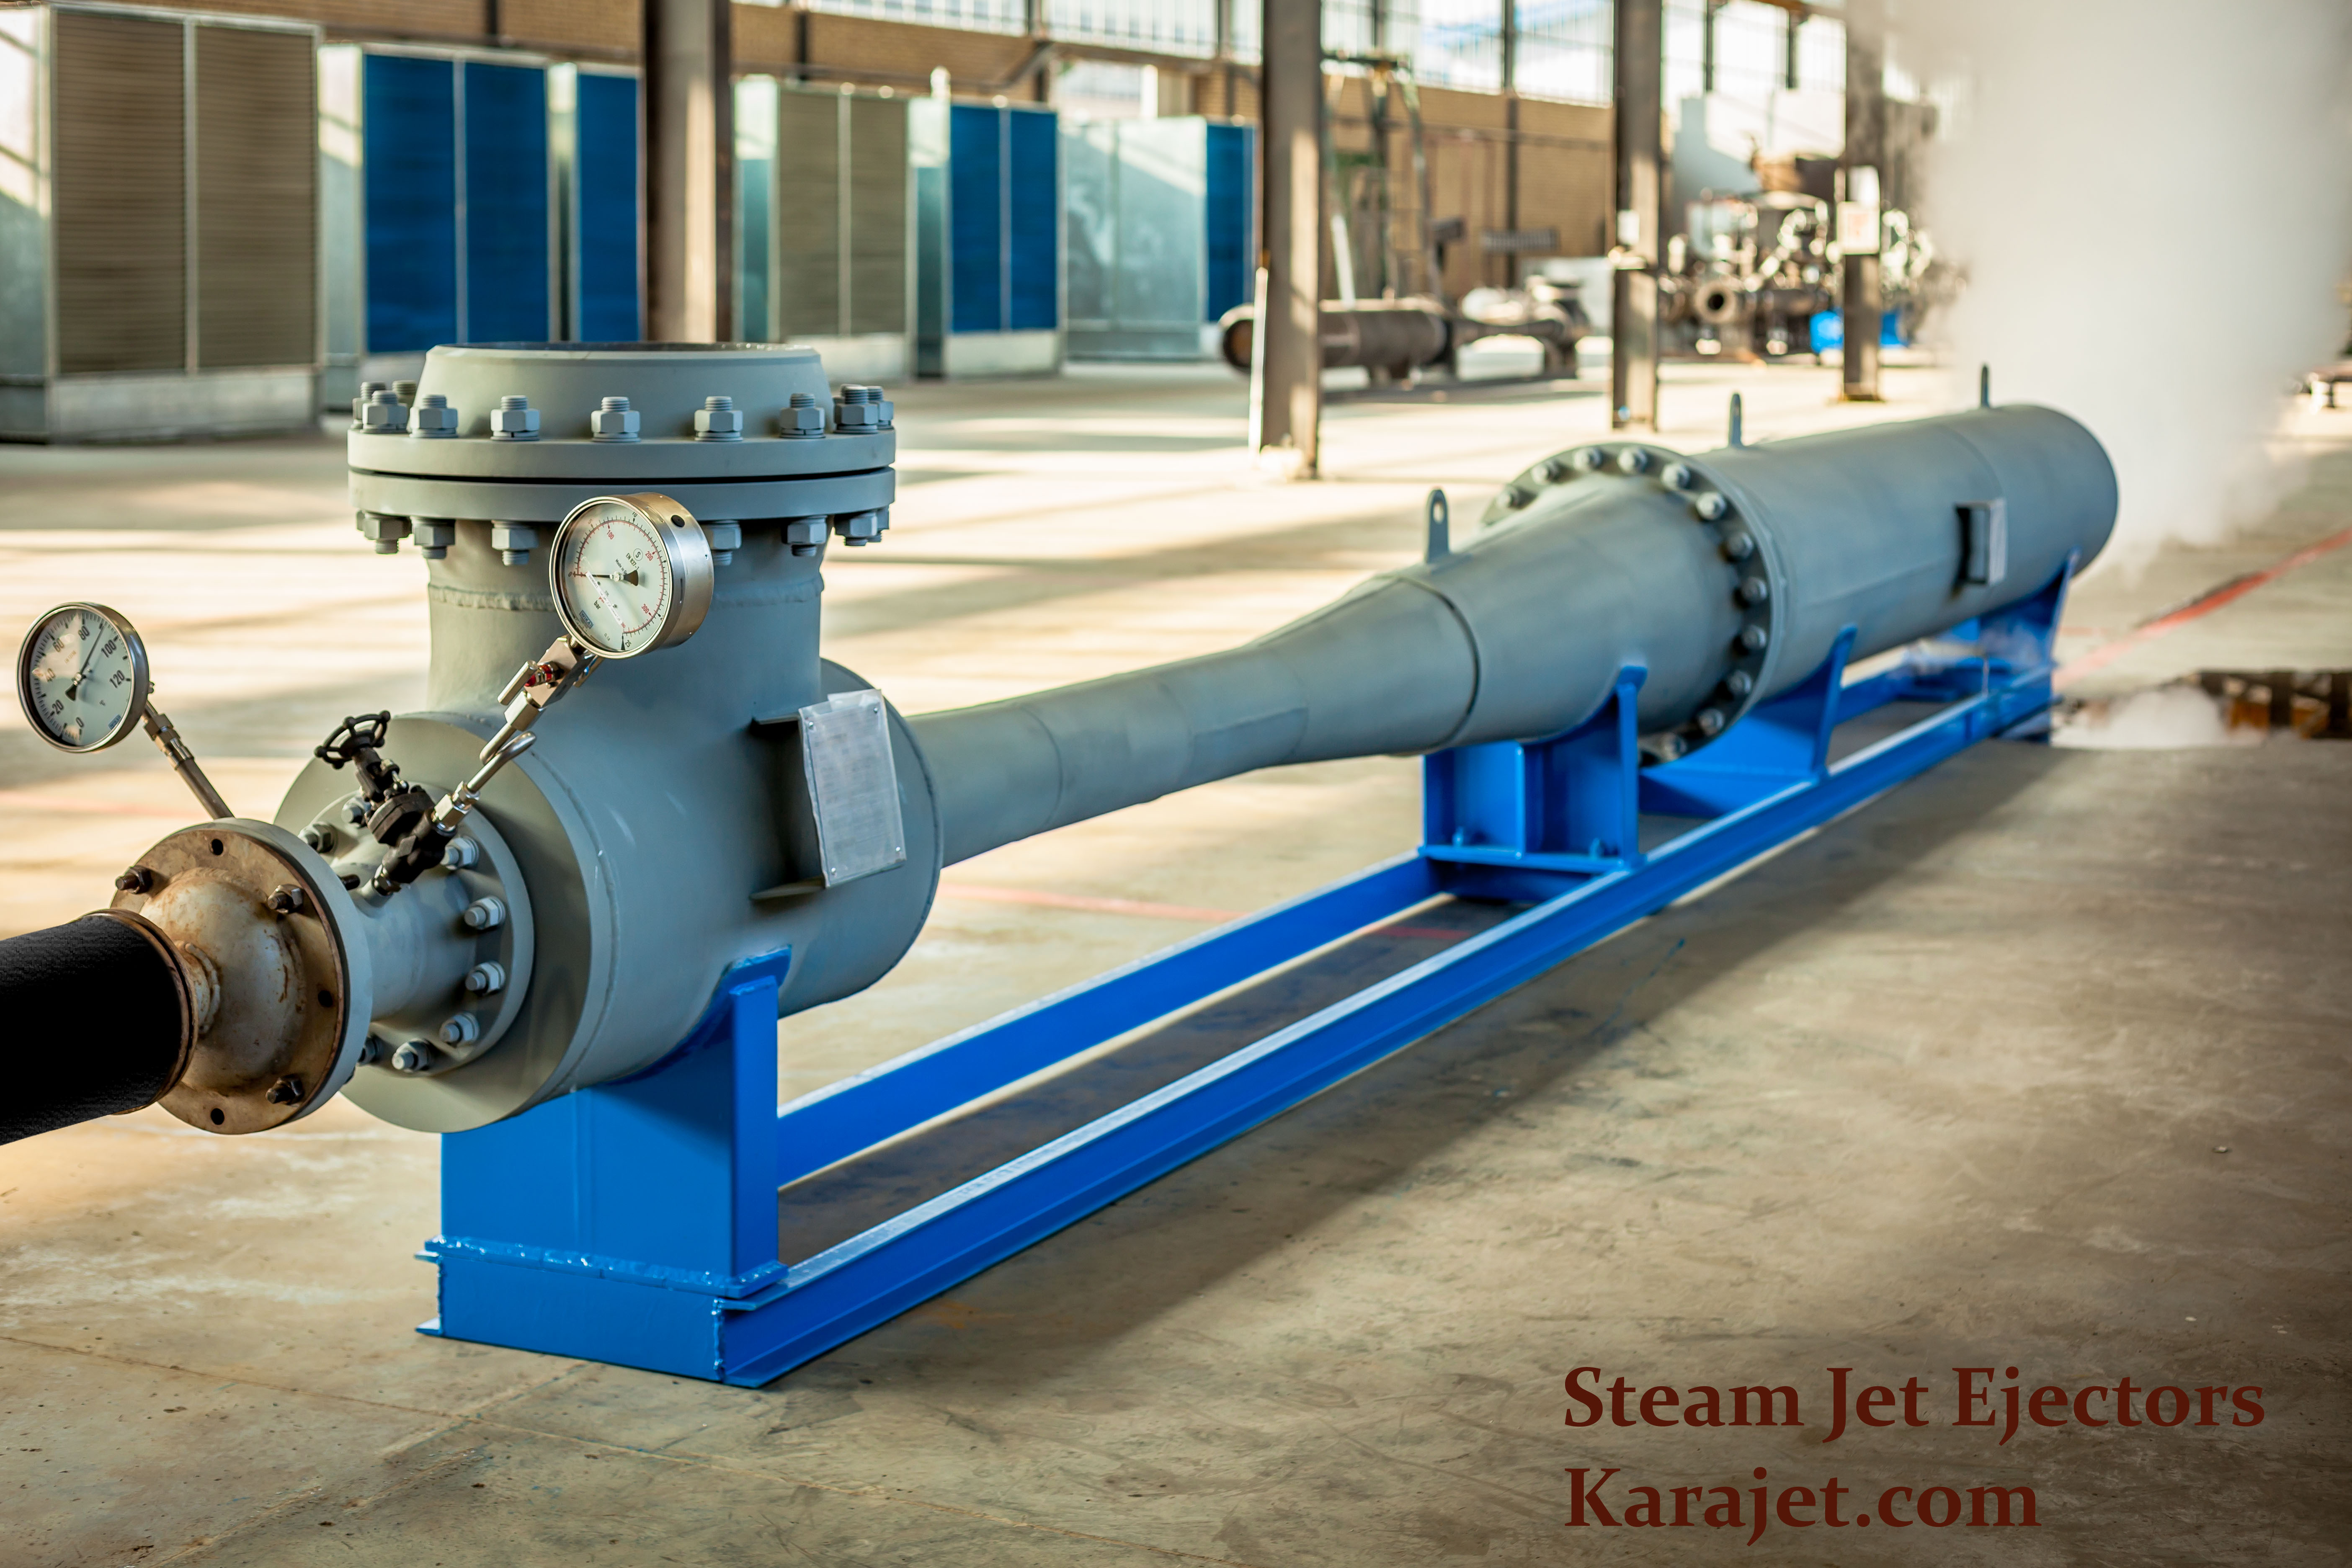 Steam Jet Ejector. Karajet.com